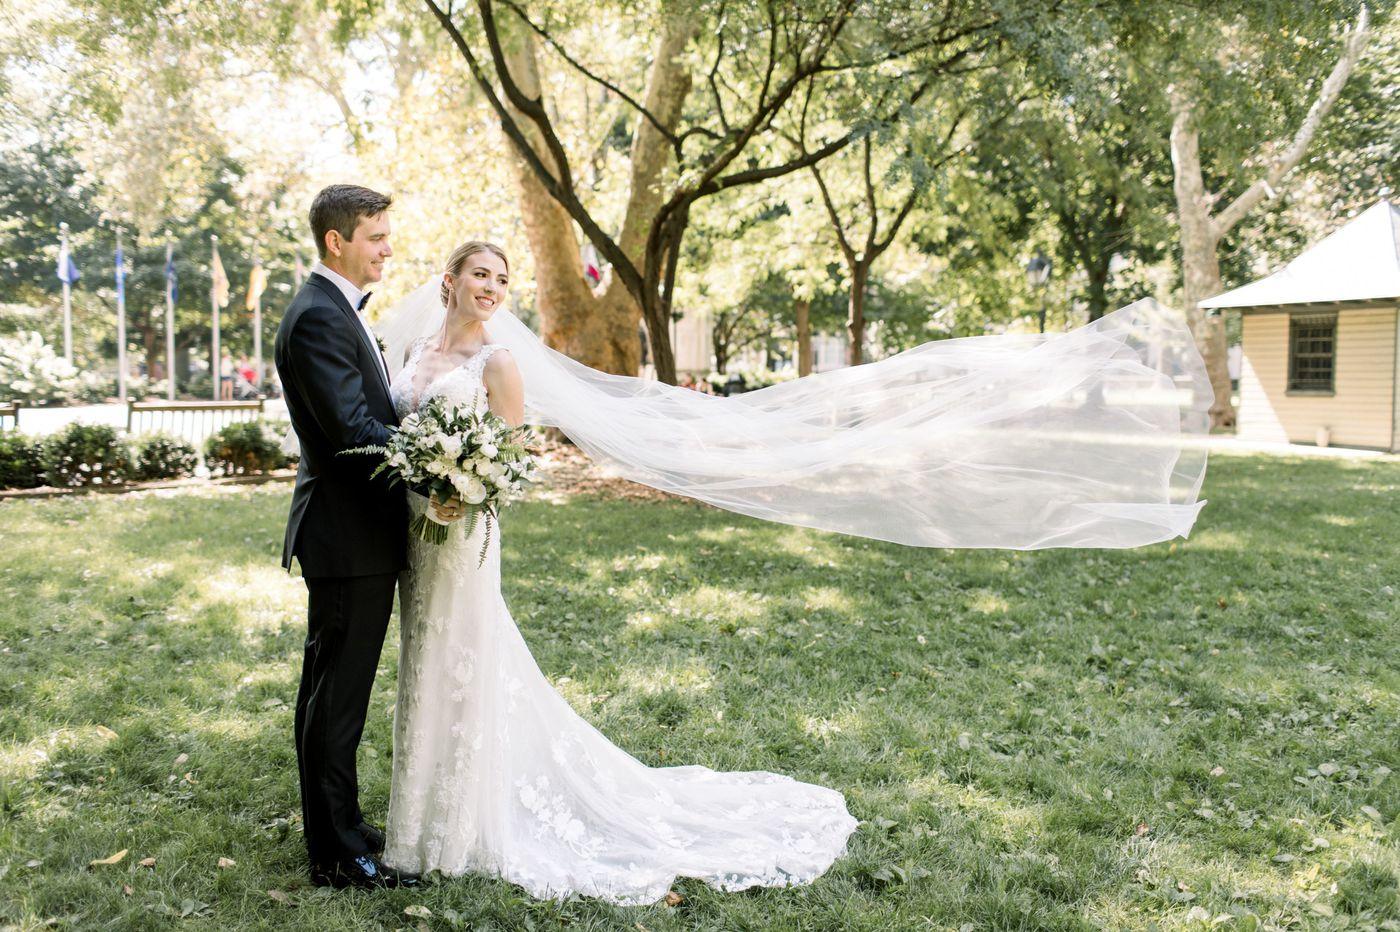 Philadelphia Weddings: Tessica Glancey and Robert Crampton